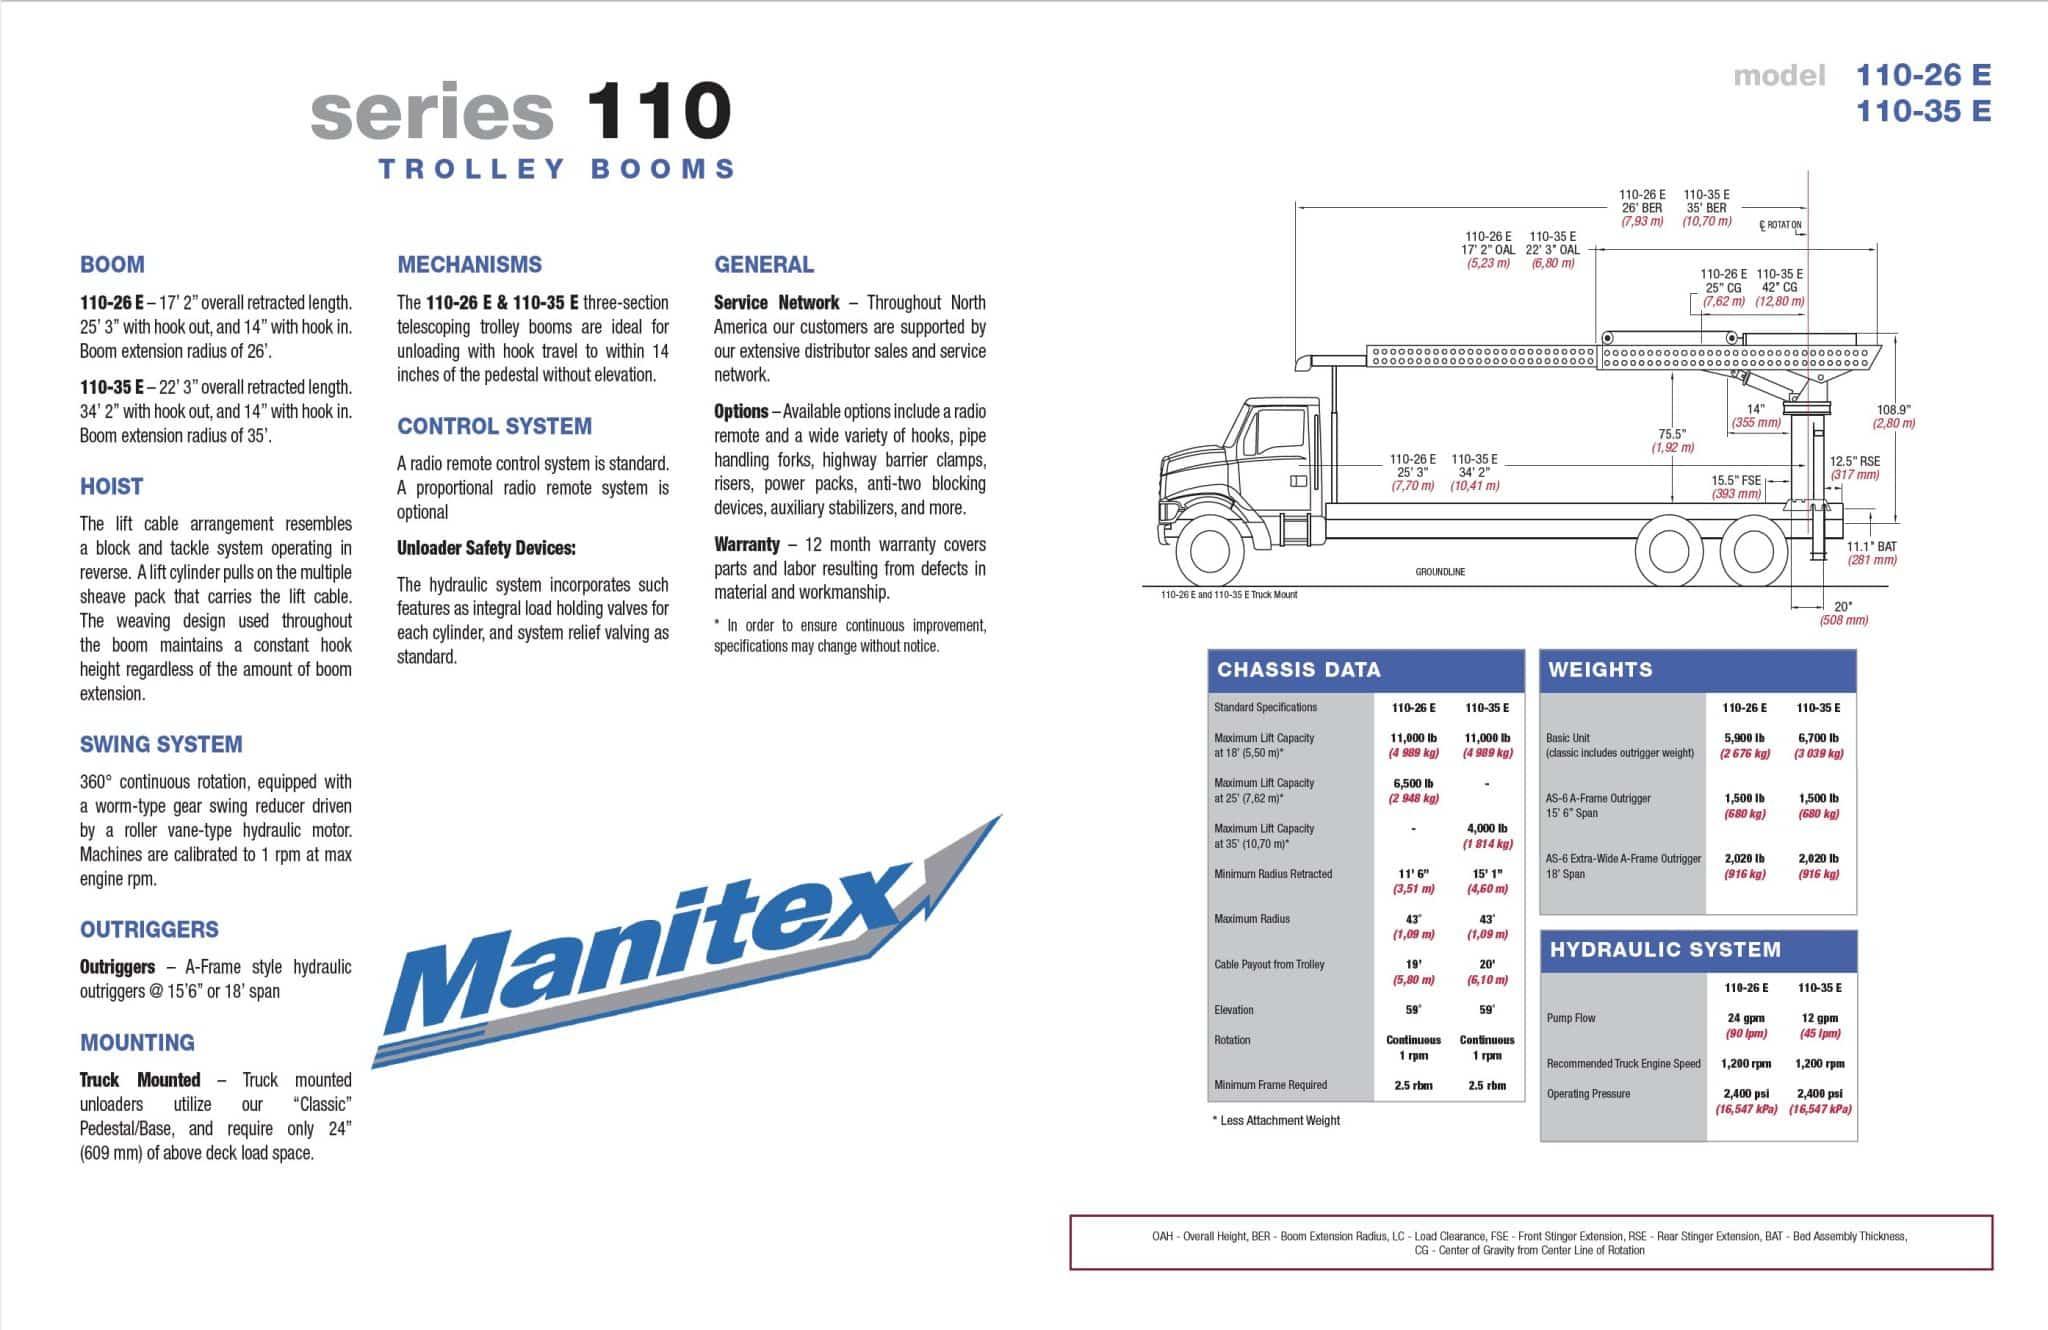 Manitex Trolly Booms.pdf 2019-03-14 12-55-32